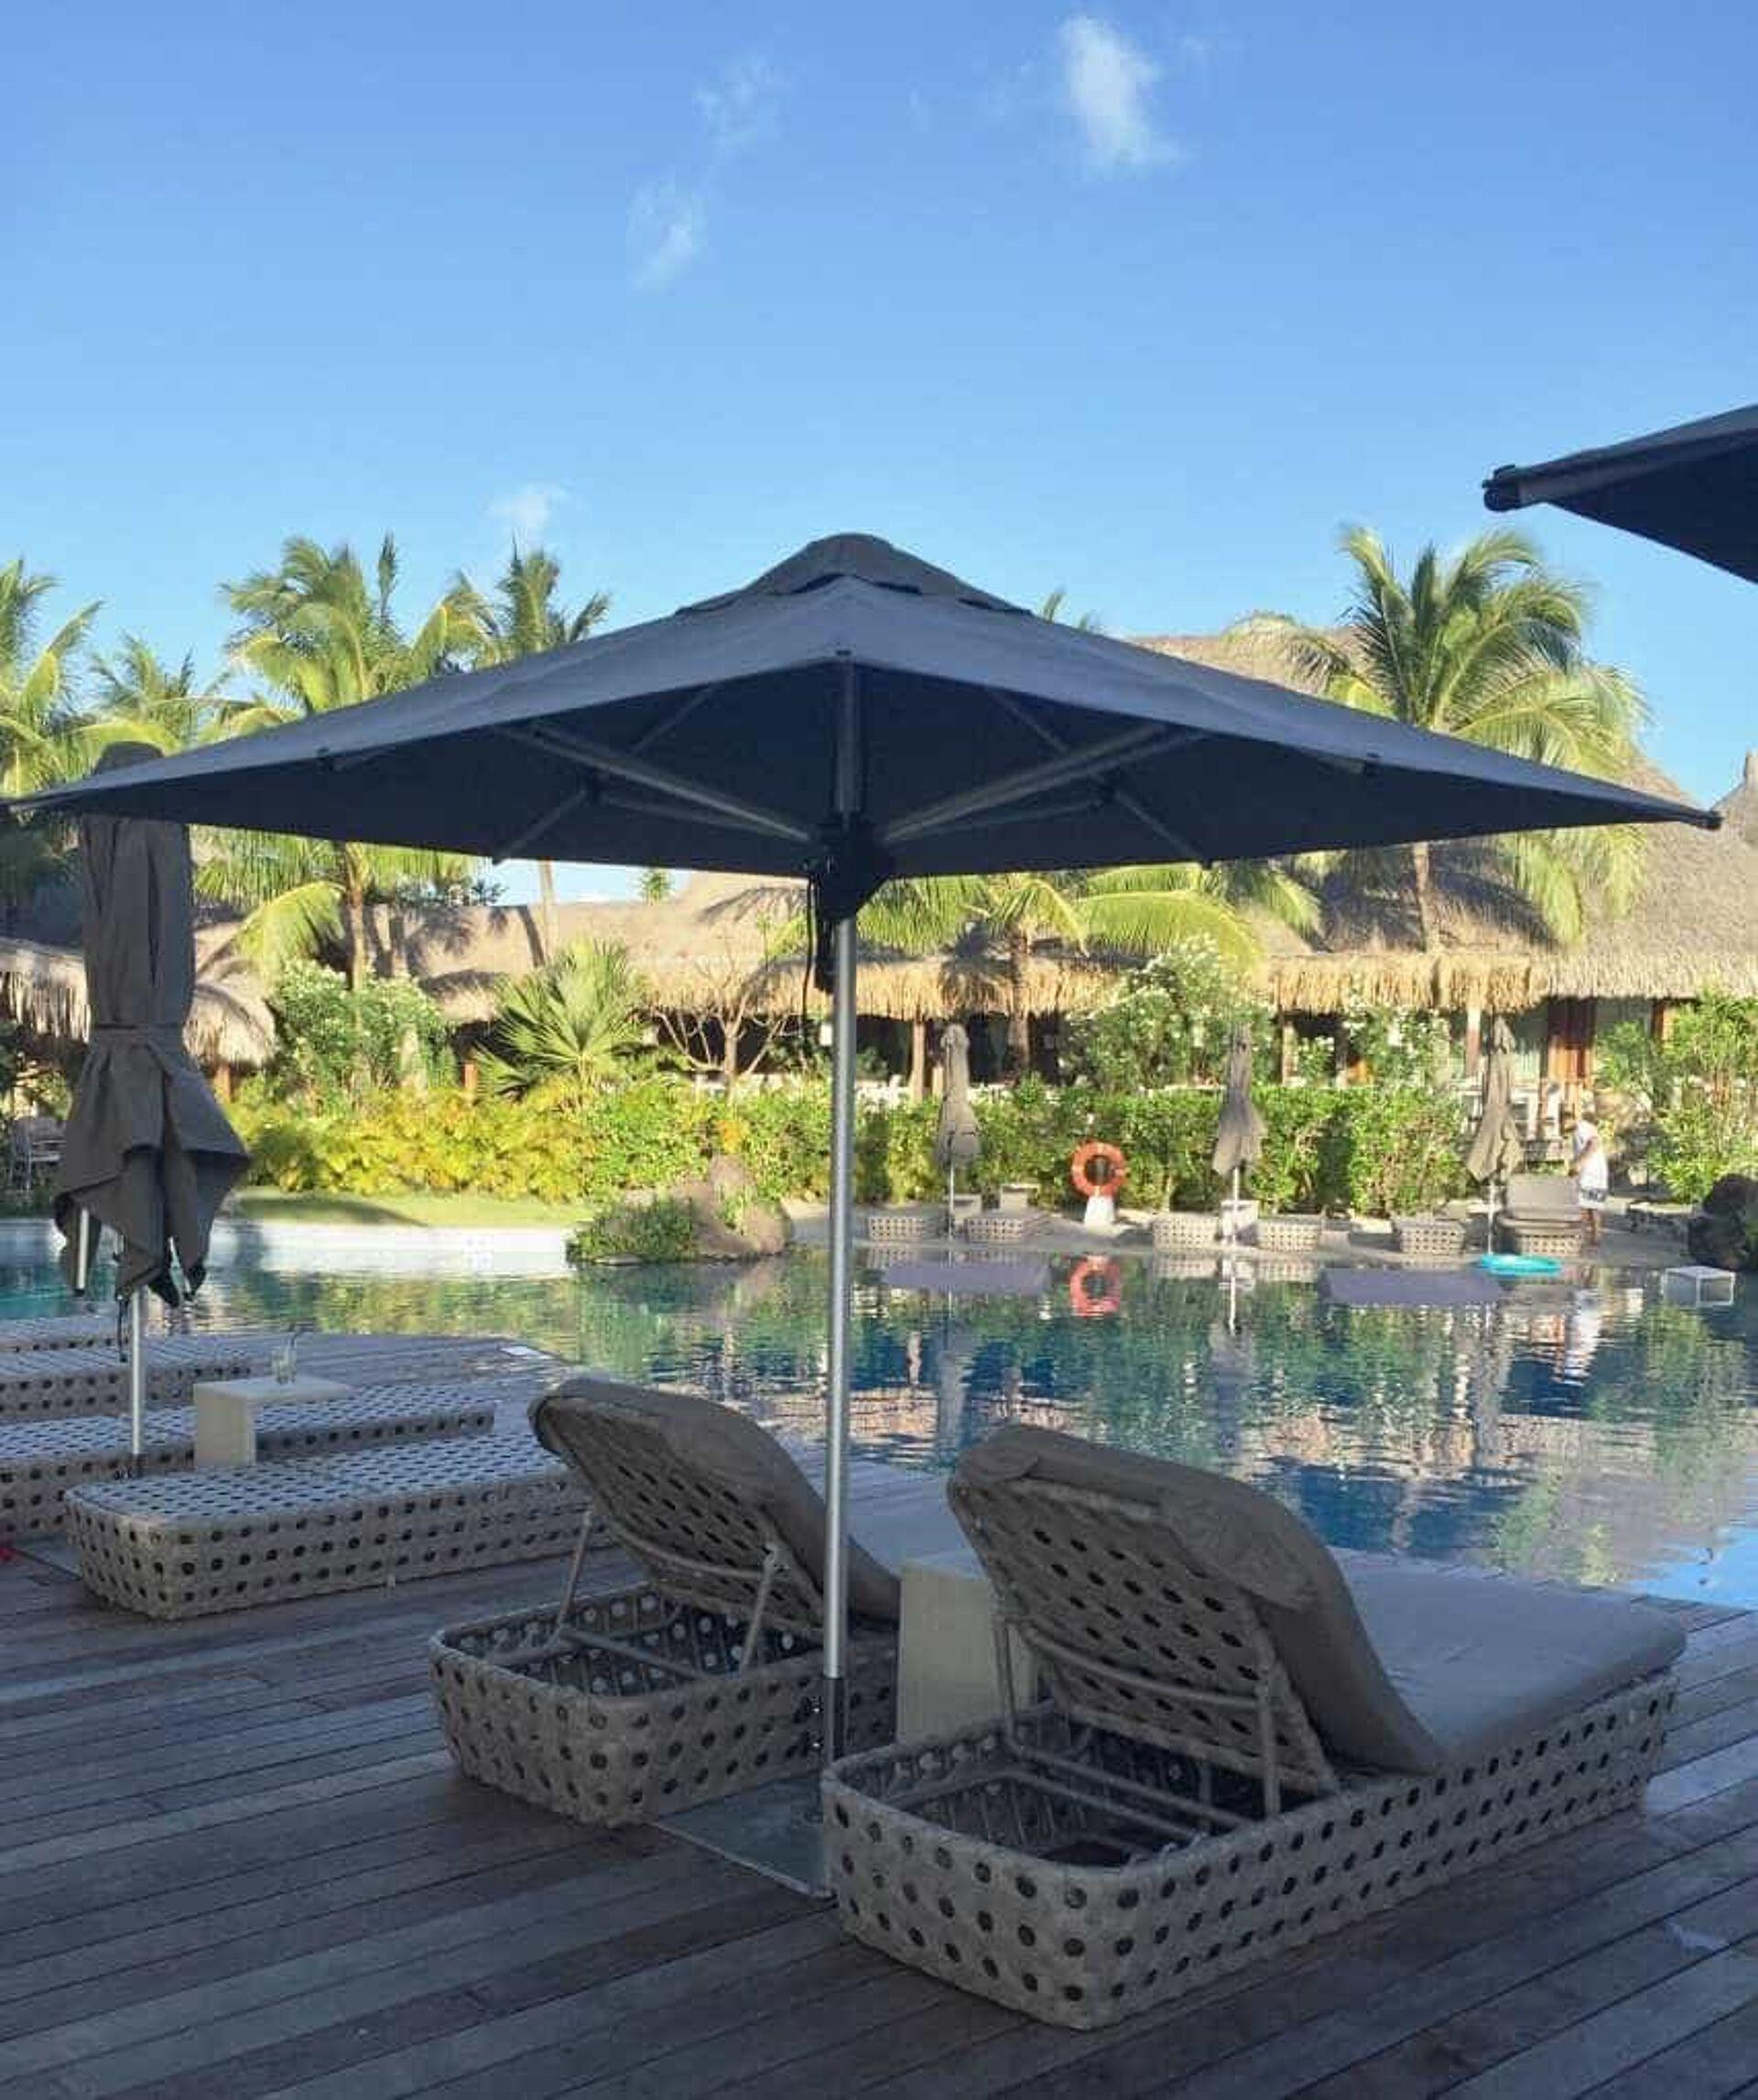 St Regis Bora Bora Resort Monaco Outdoor Umbrella from Shade7